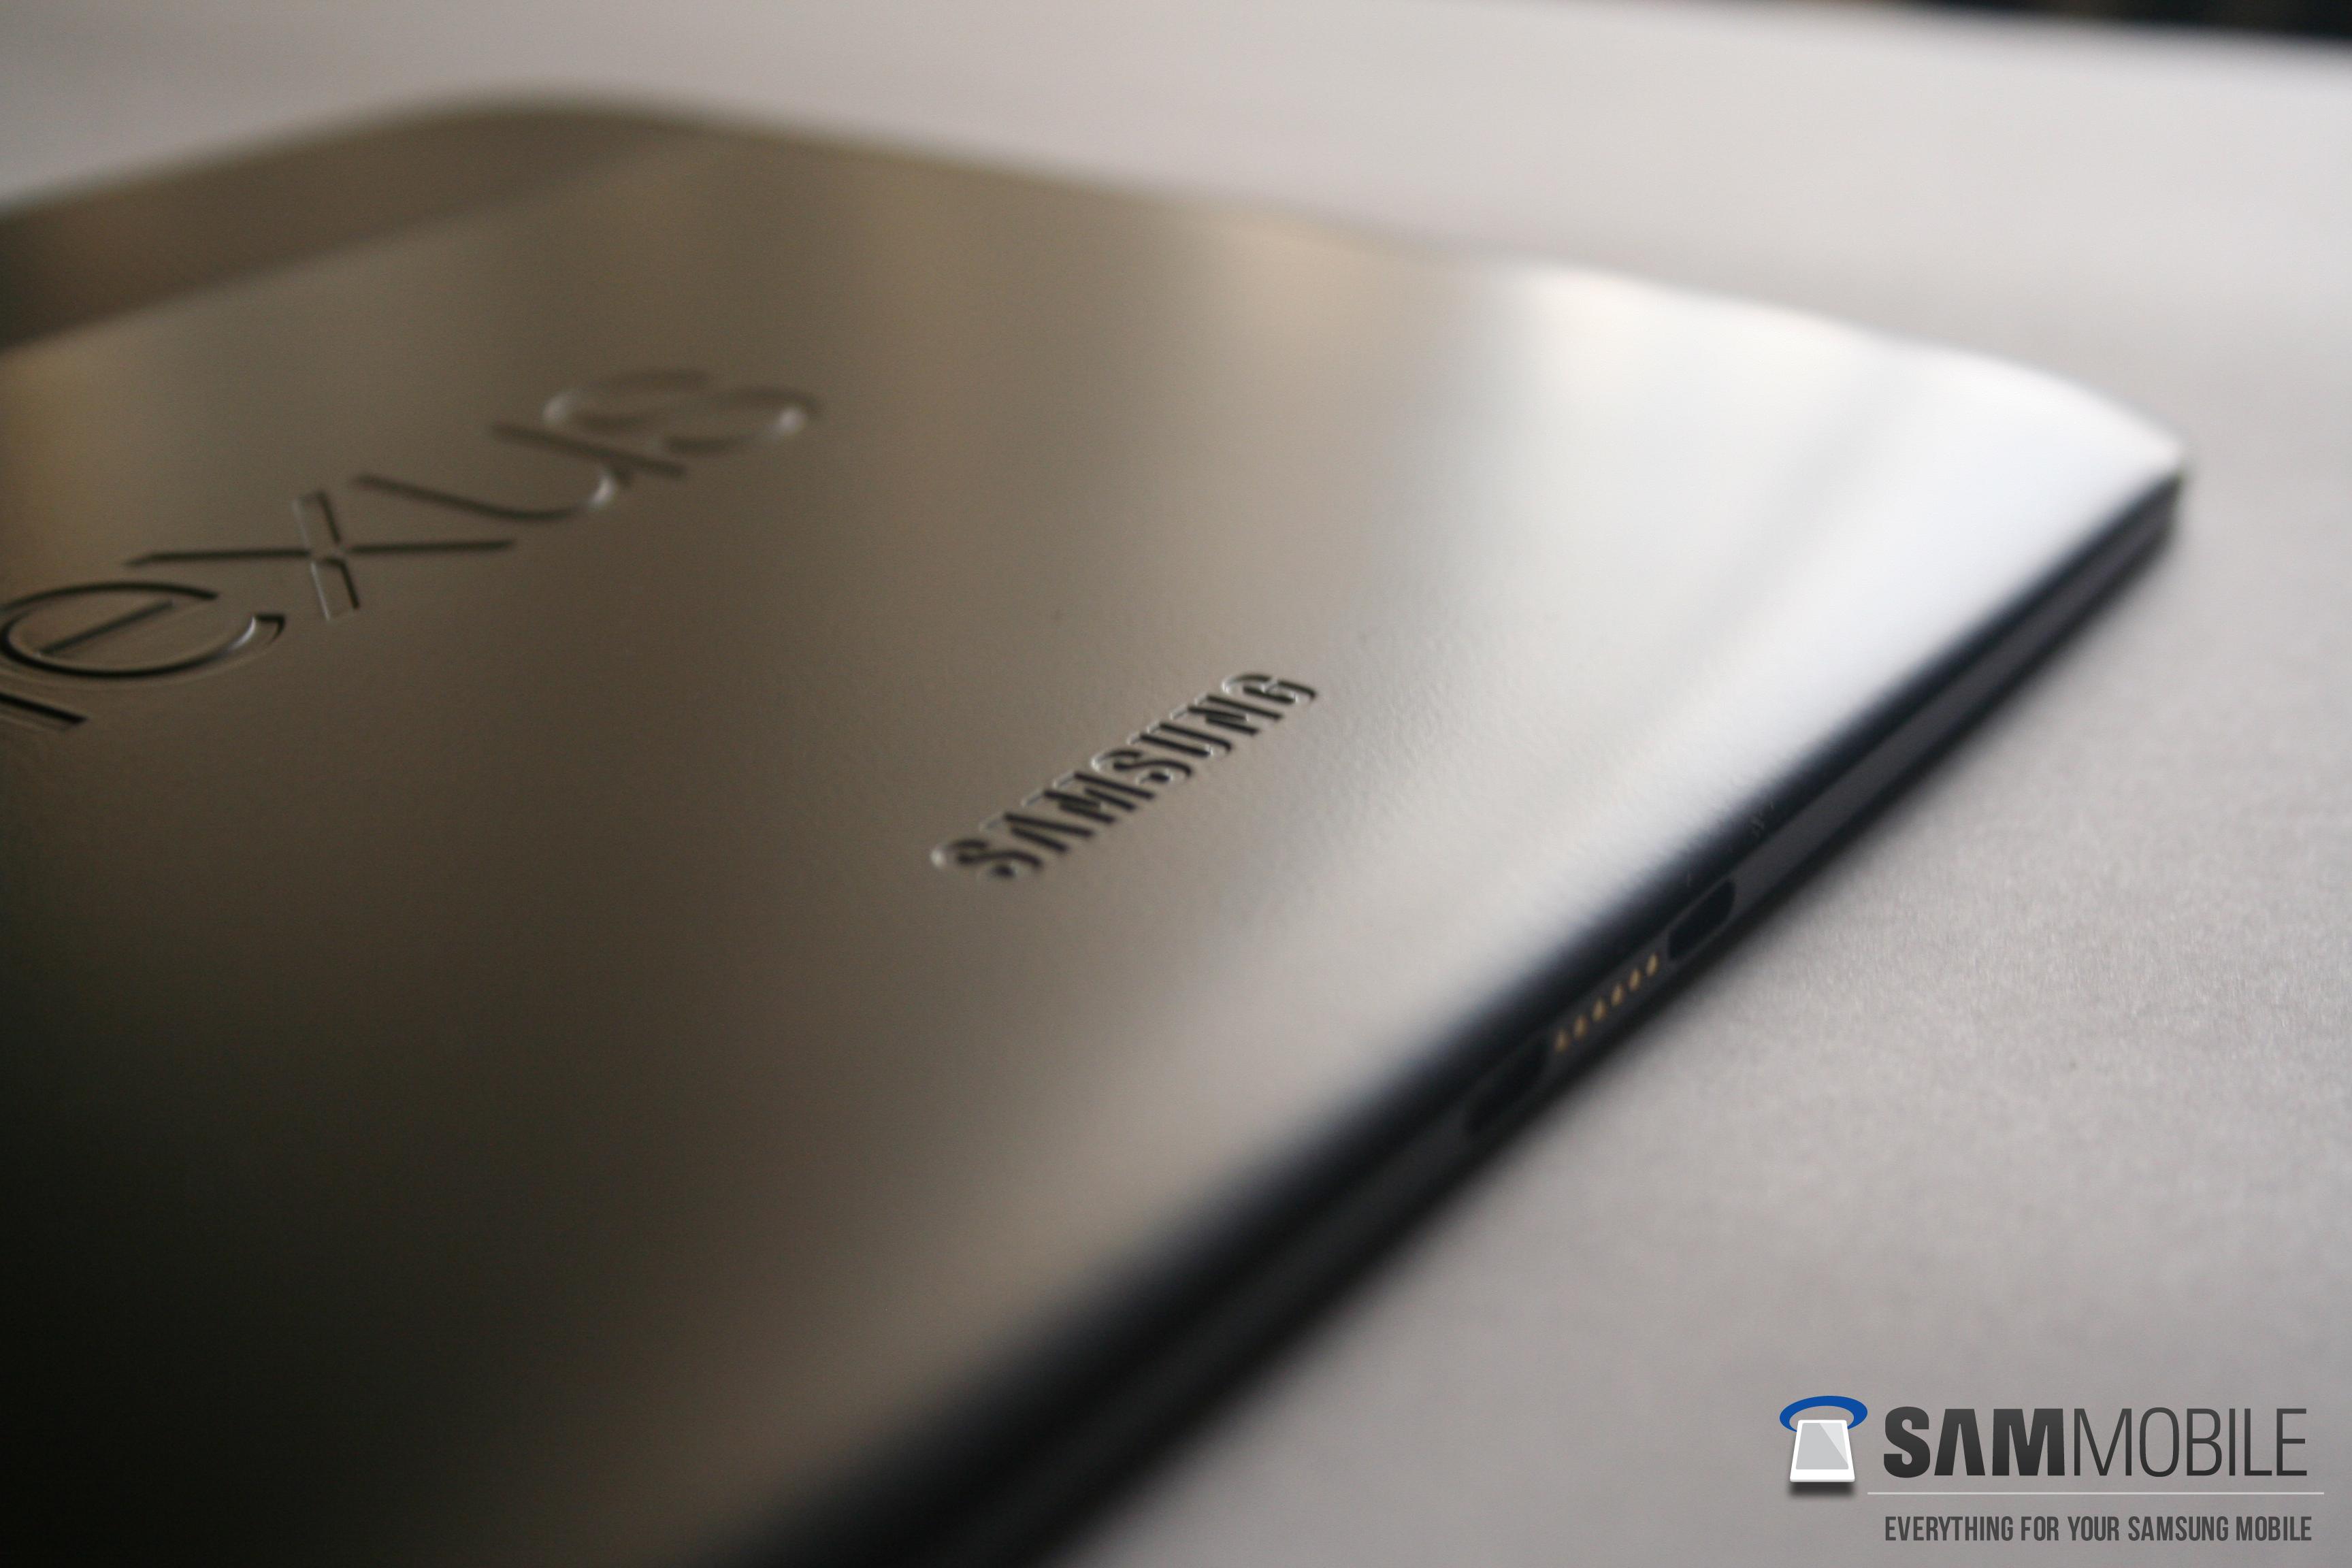 http://www.sammobile.com/wp-content/uploads/2013/02/Nexus10-3.jpg